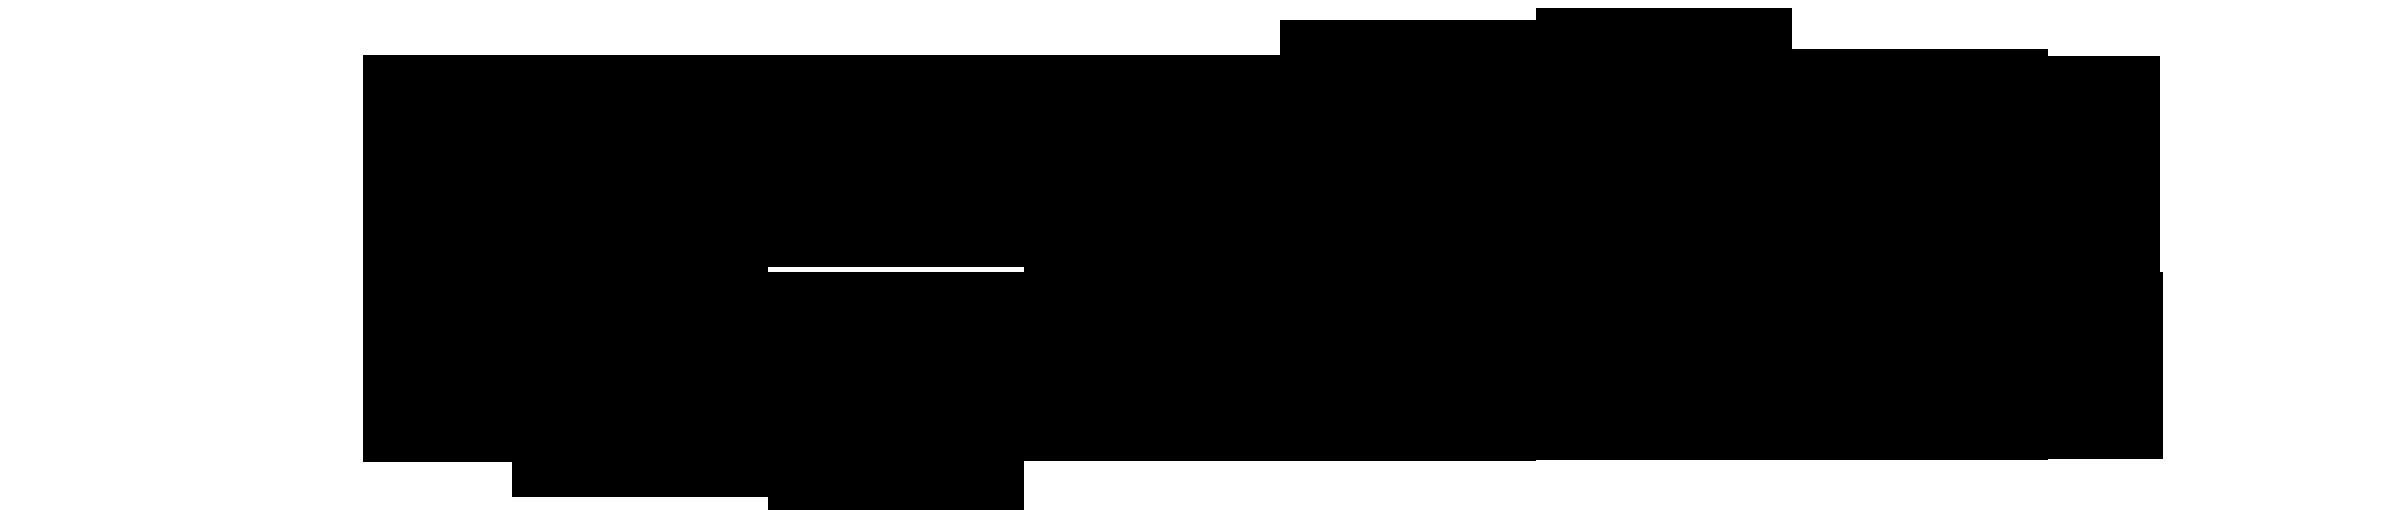 Skullmanbaby